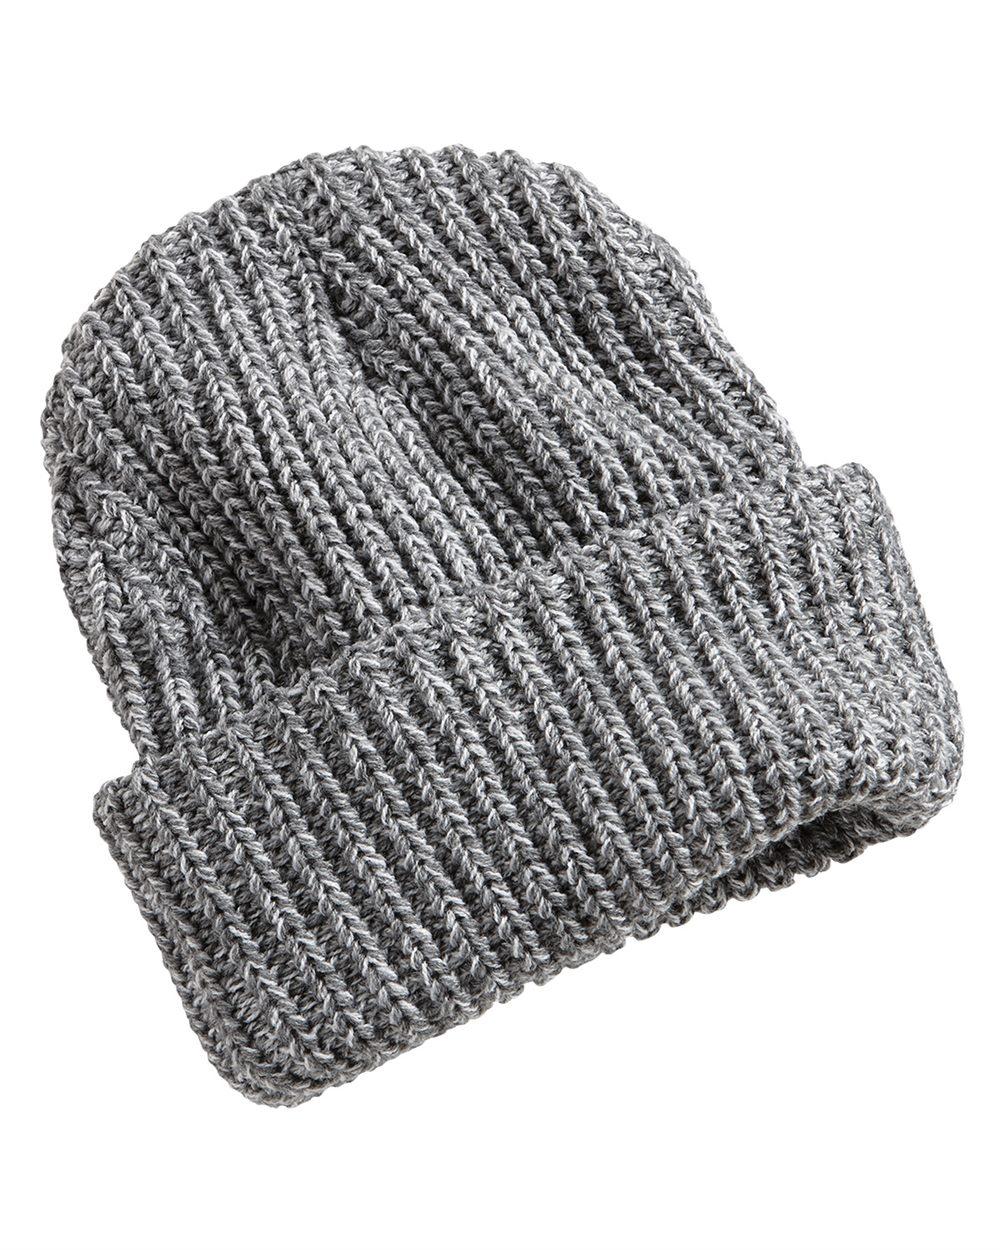 "Sportsman SP90 - 12"" Chunky Knit Cuffed Beanie"